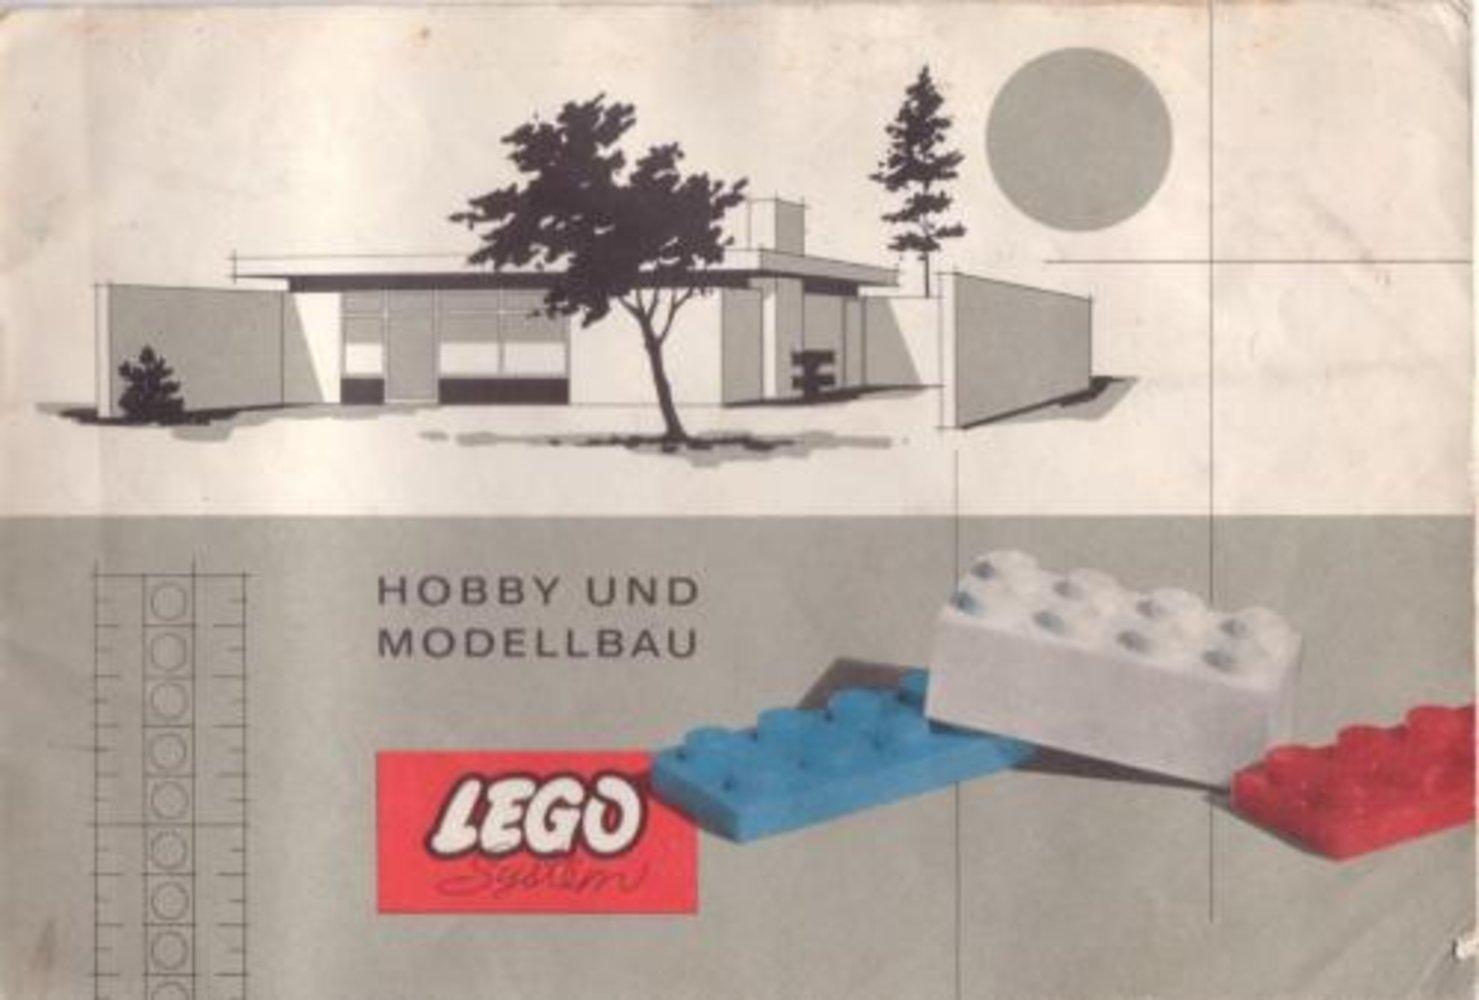 LEGO Hobby und Modellbau